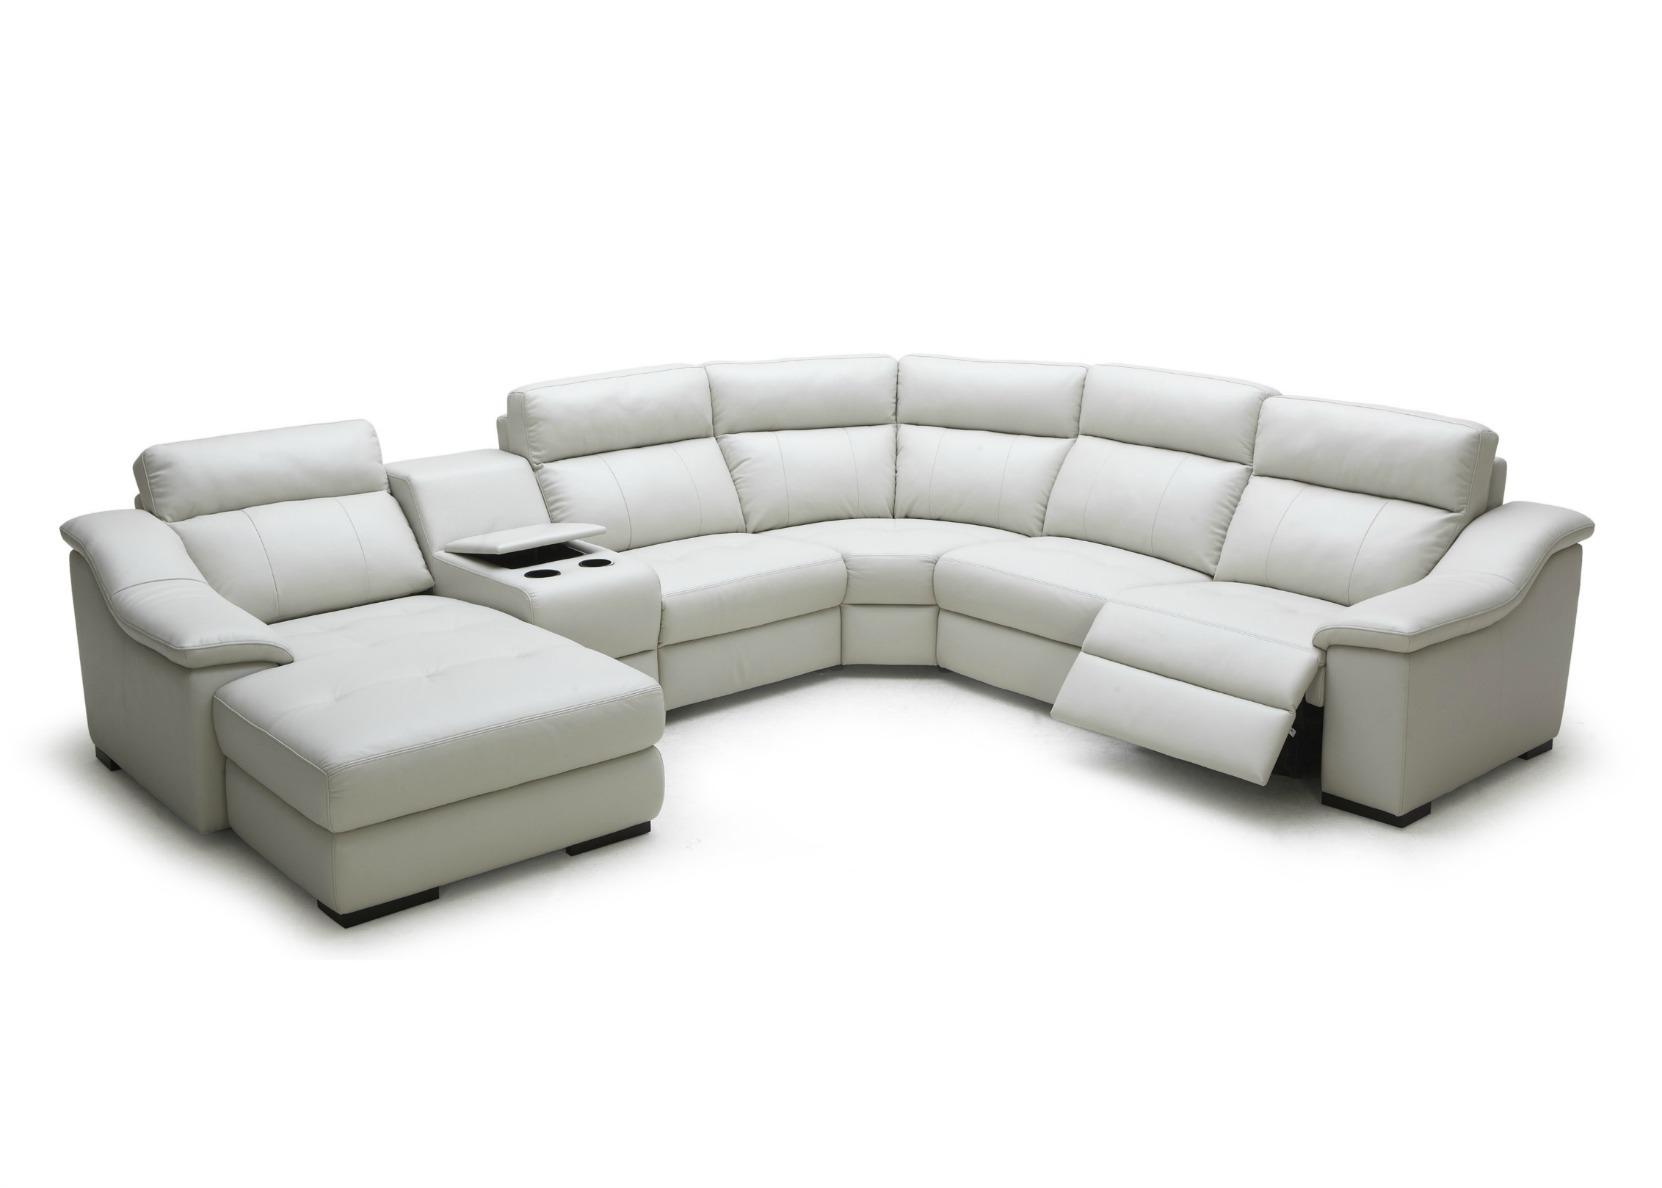 Modular Group Sofa With Motorized Reclining Seats Not